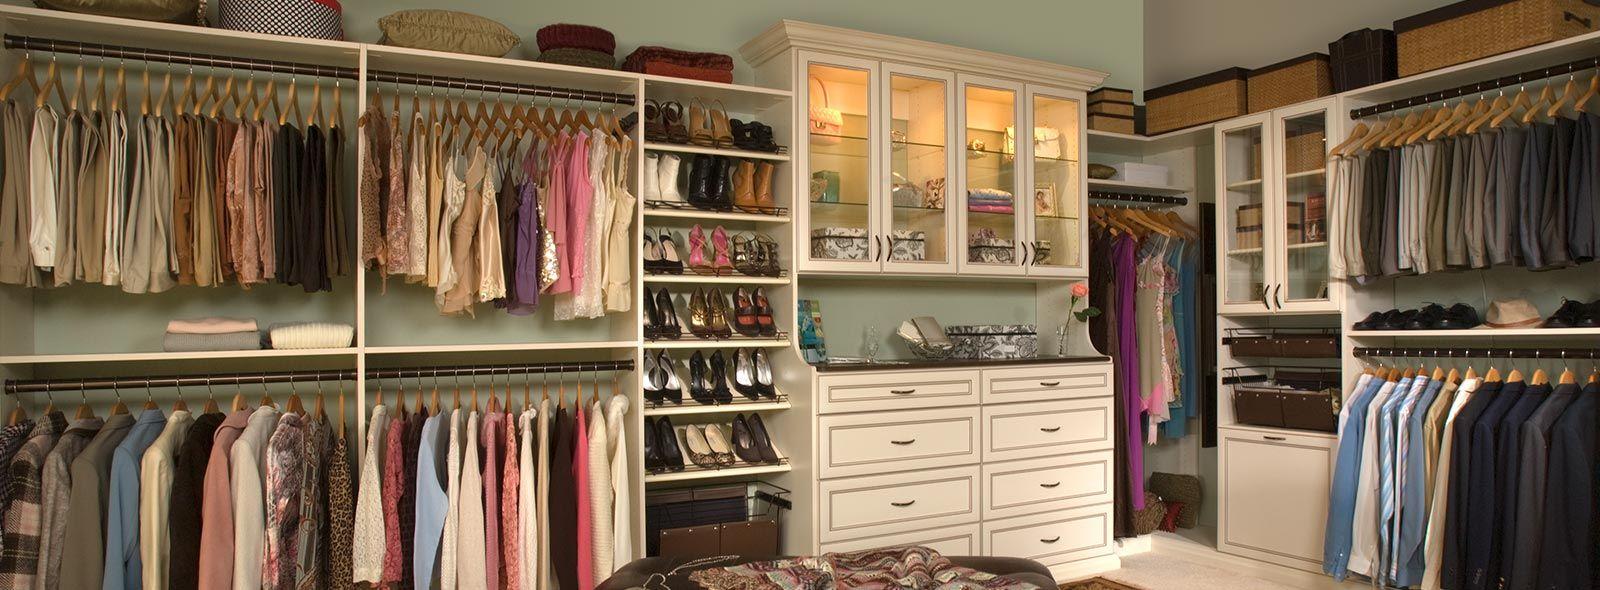 Explore Closet Organization, White Closet, And More!